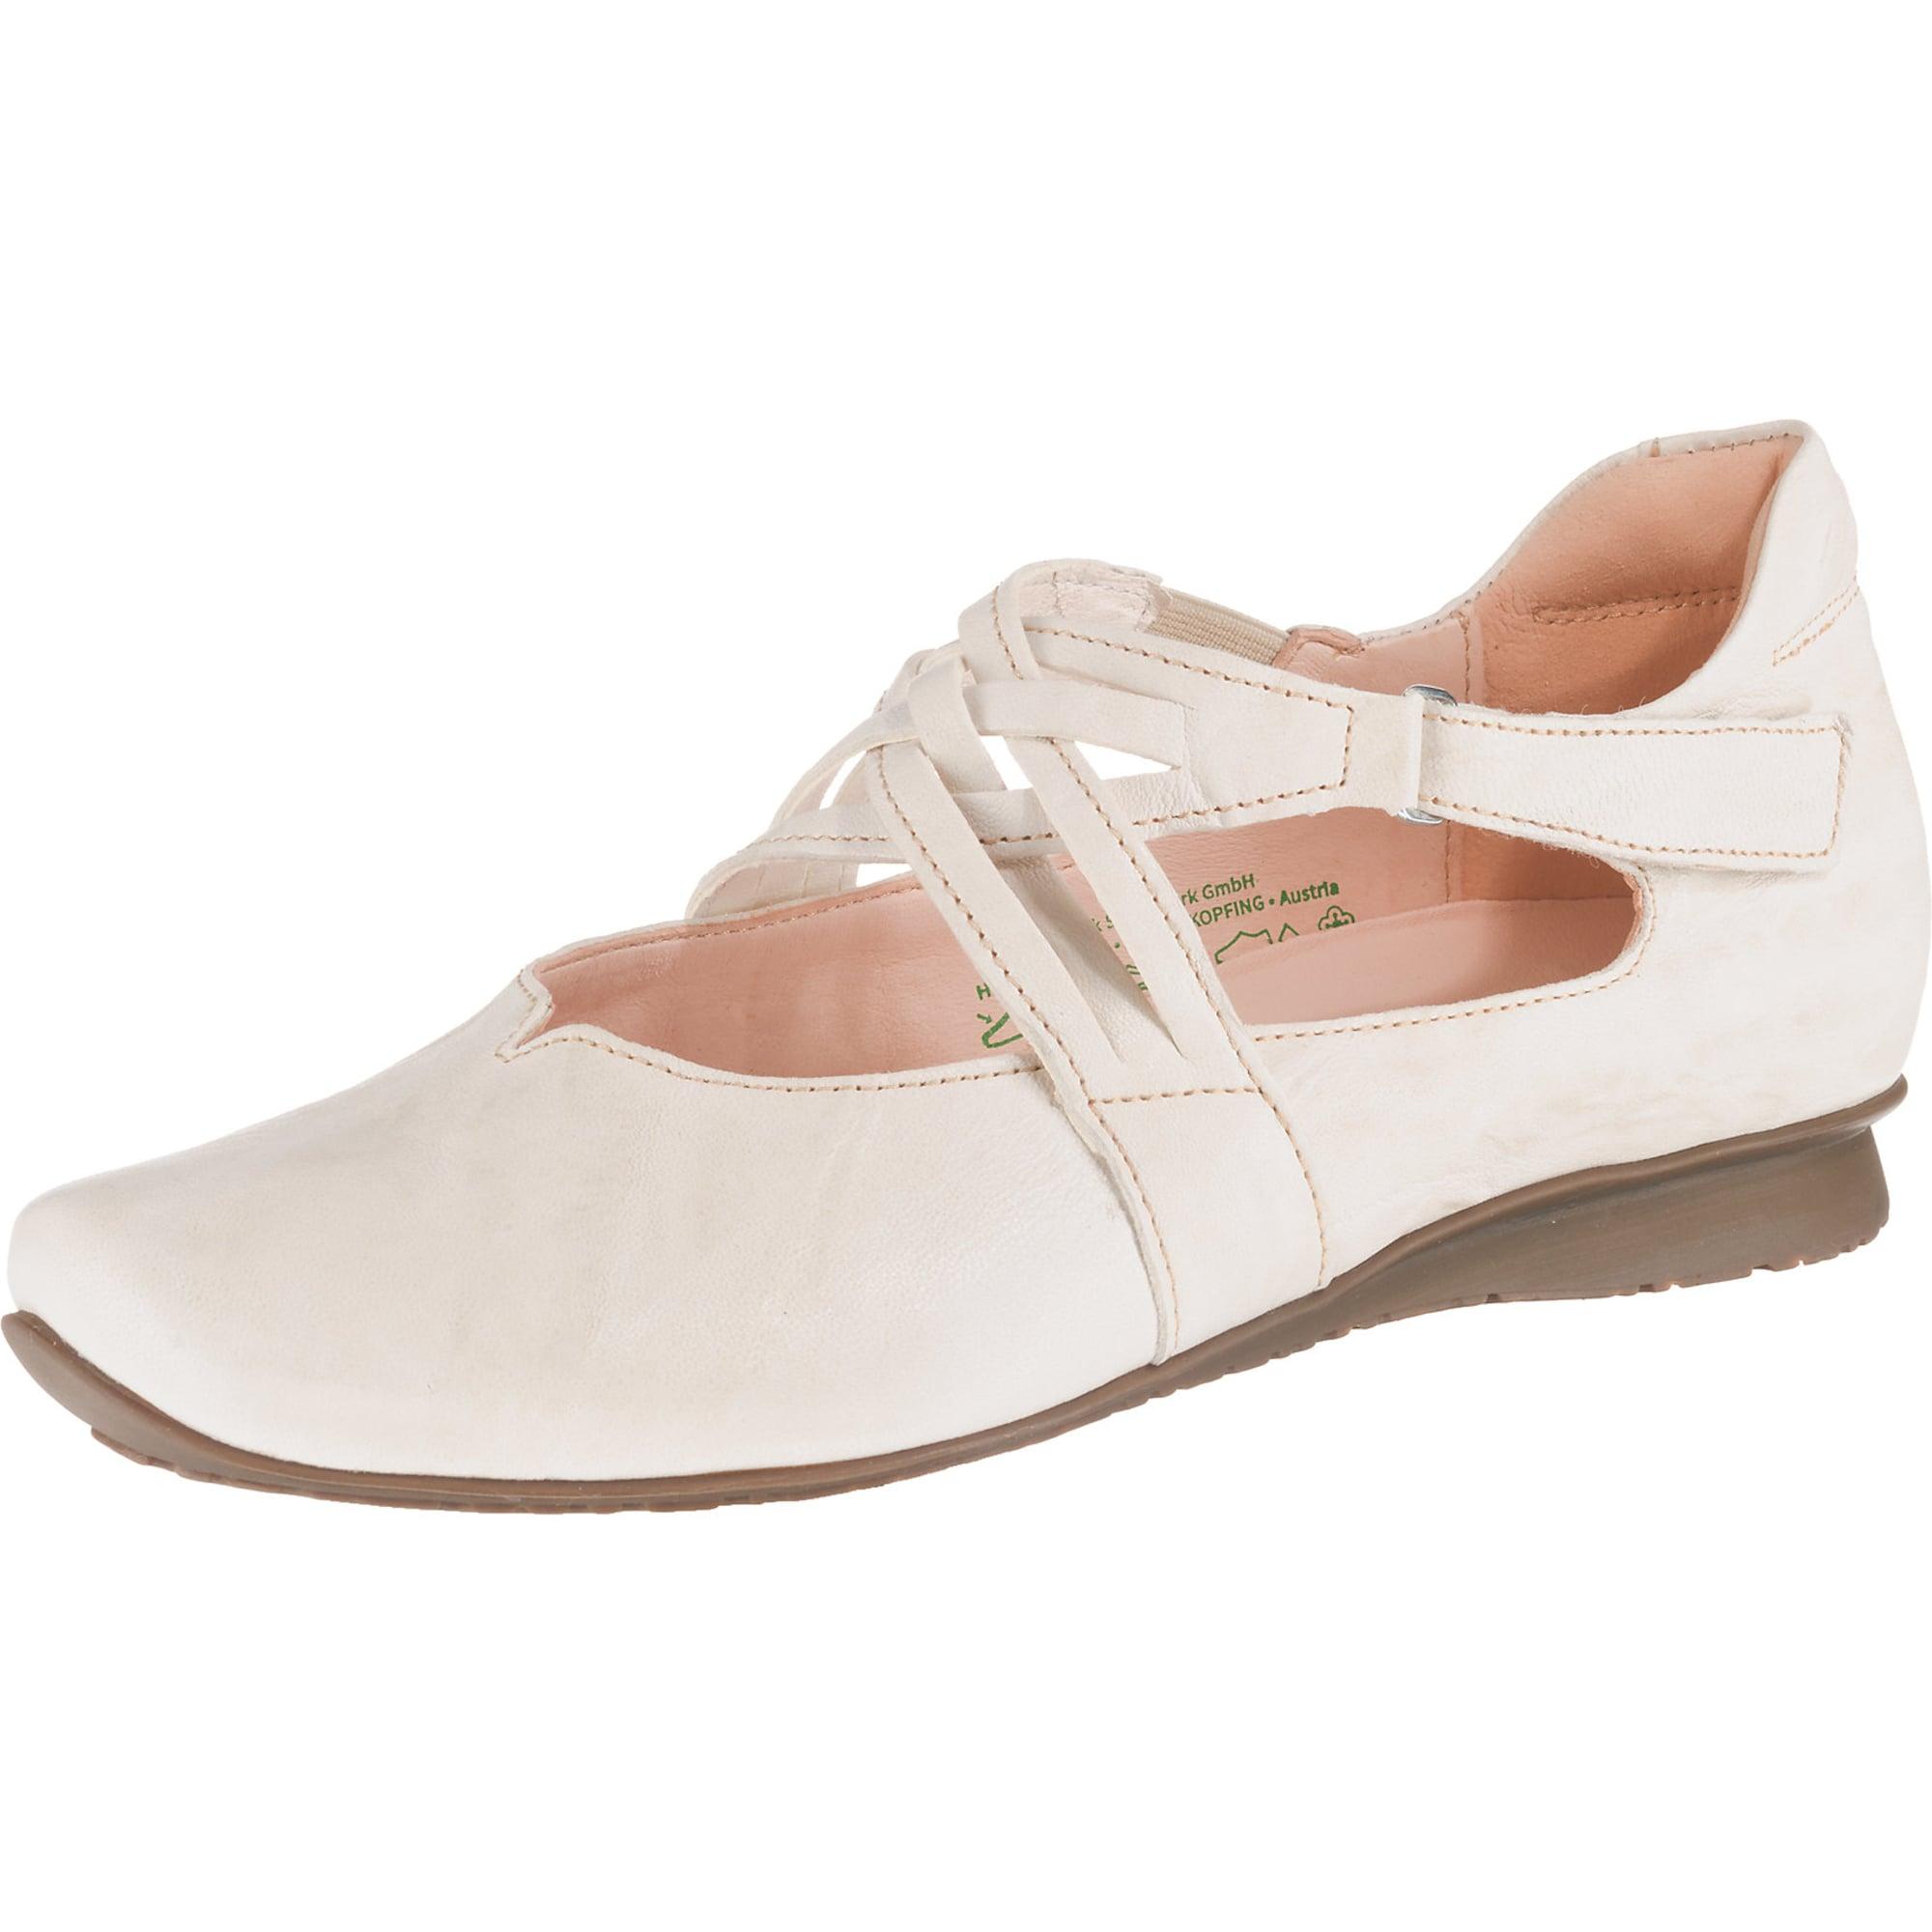 Riemchenballerinas 'Chilli' | Schuhe > Ballerinas | THINK!